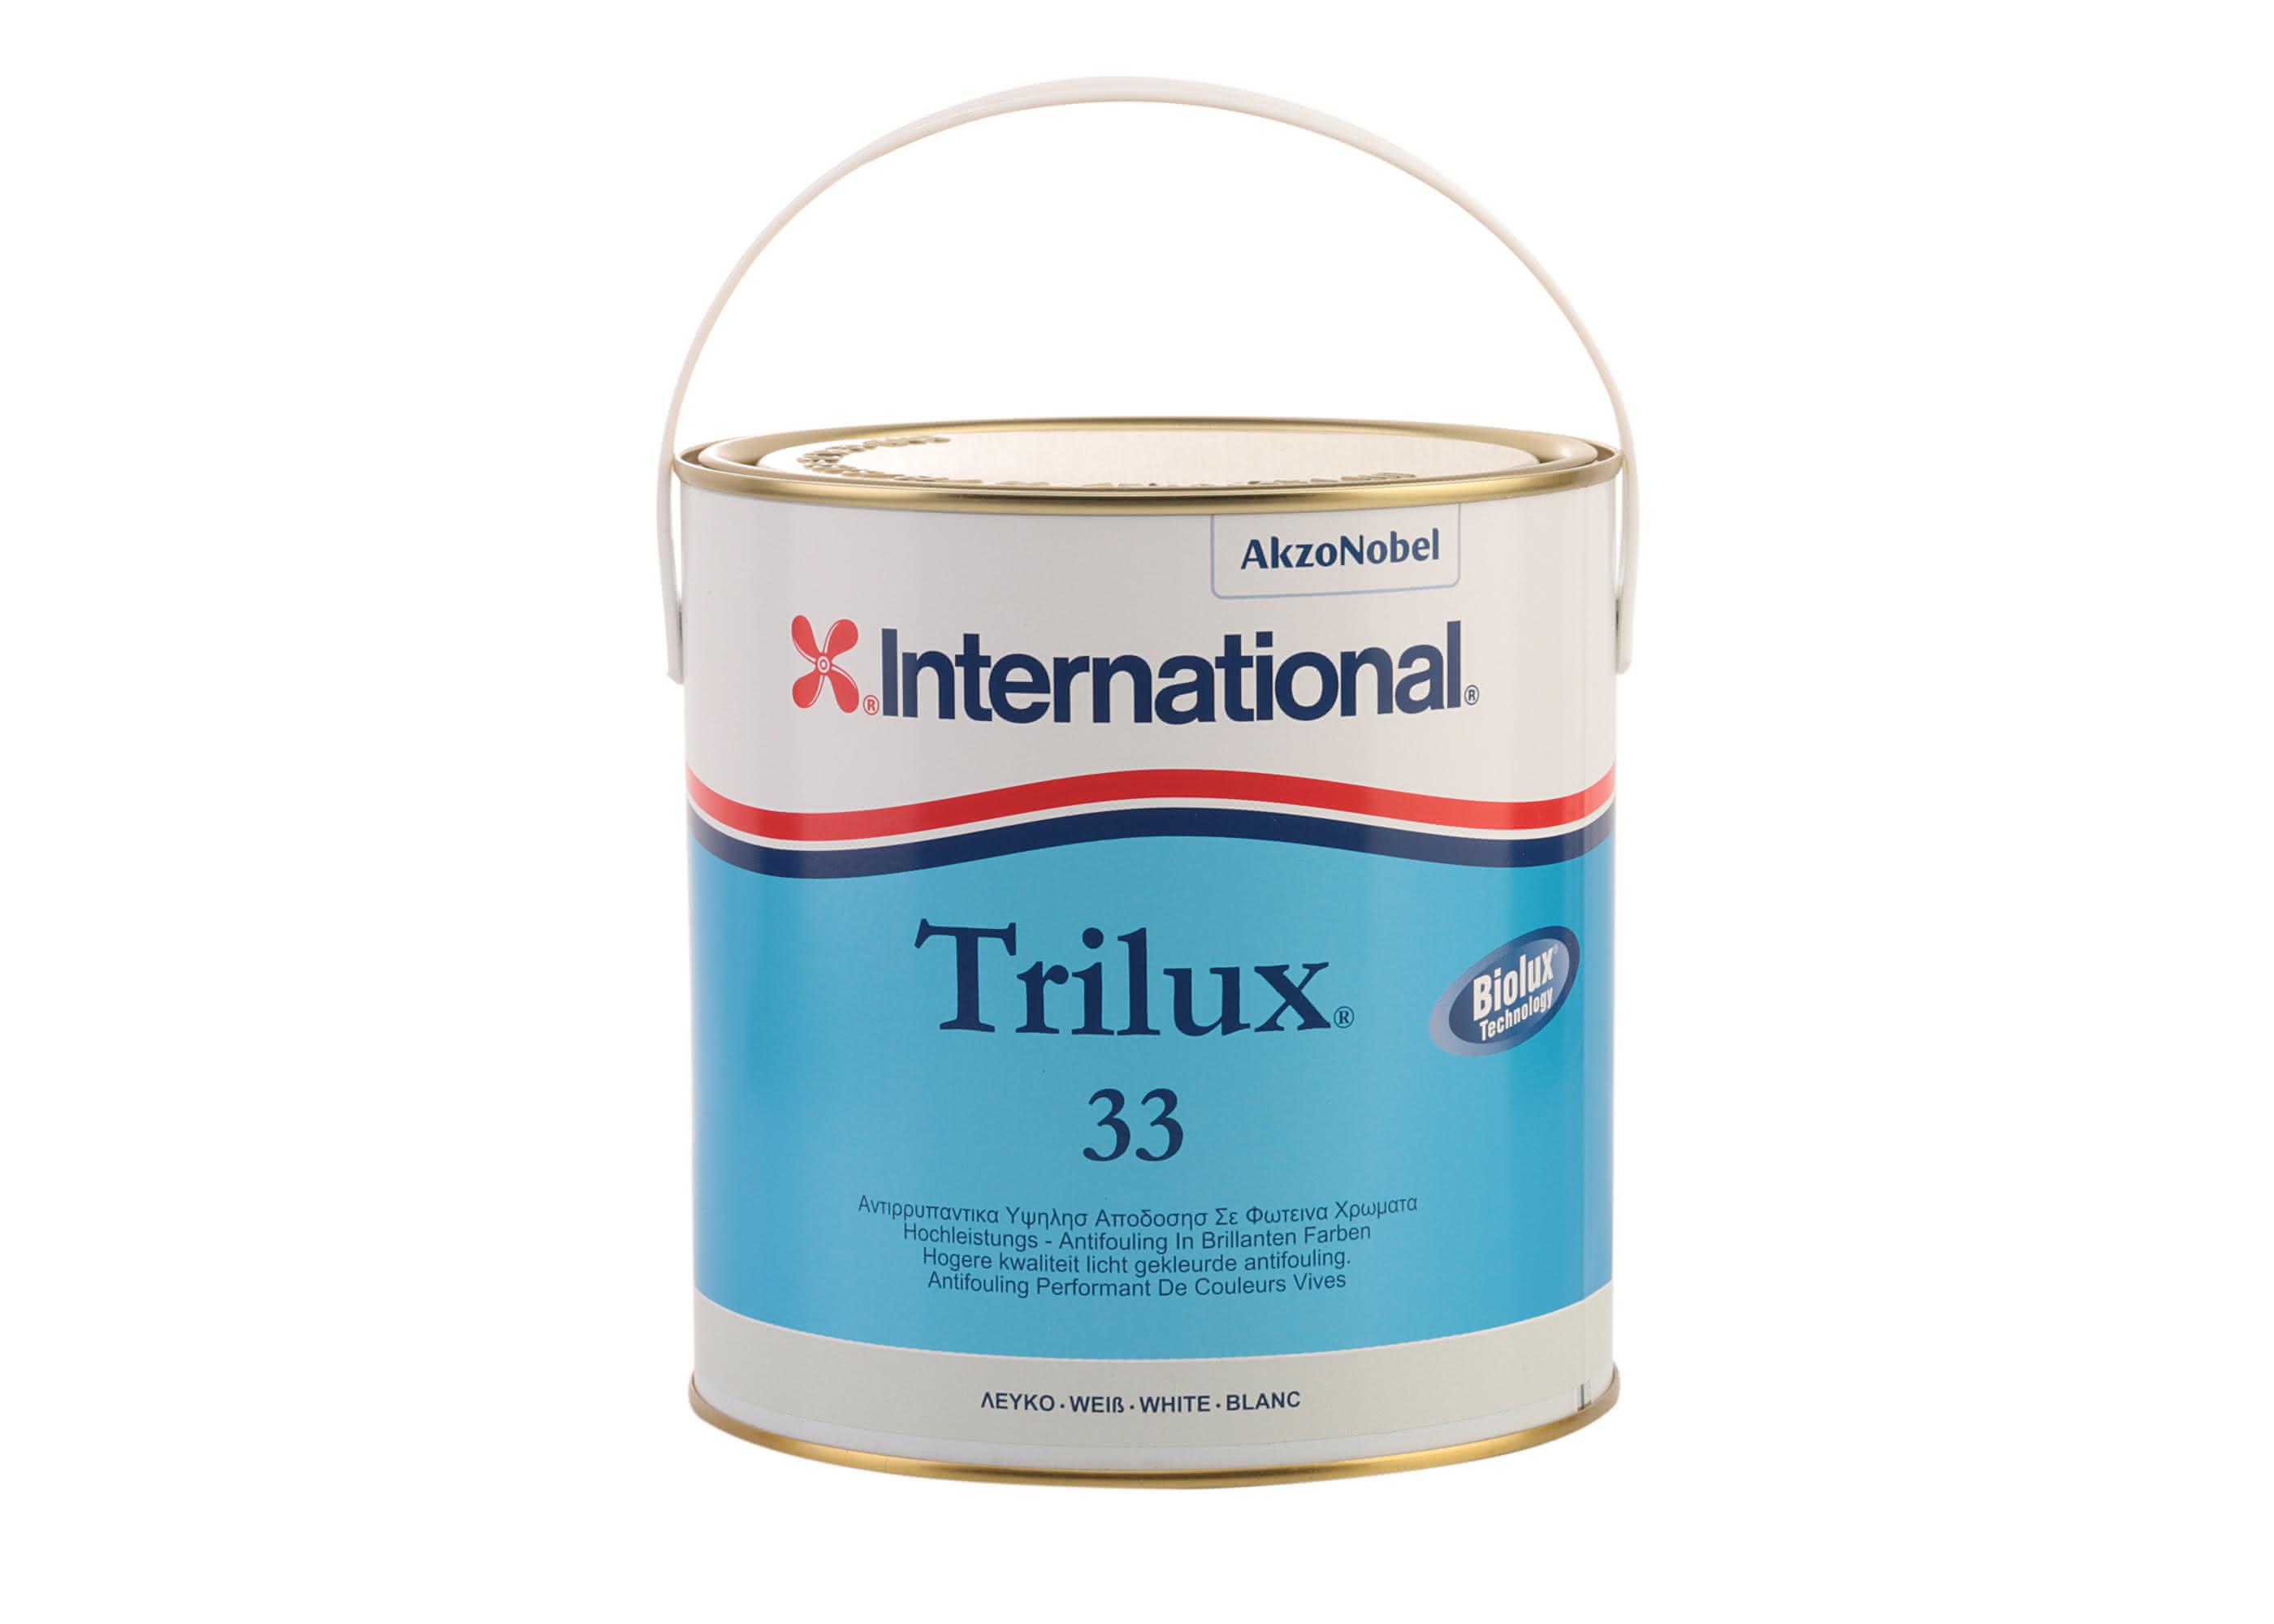 40920-INTERNATIONAL-Trilux-33.jpg